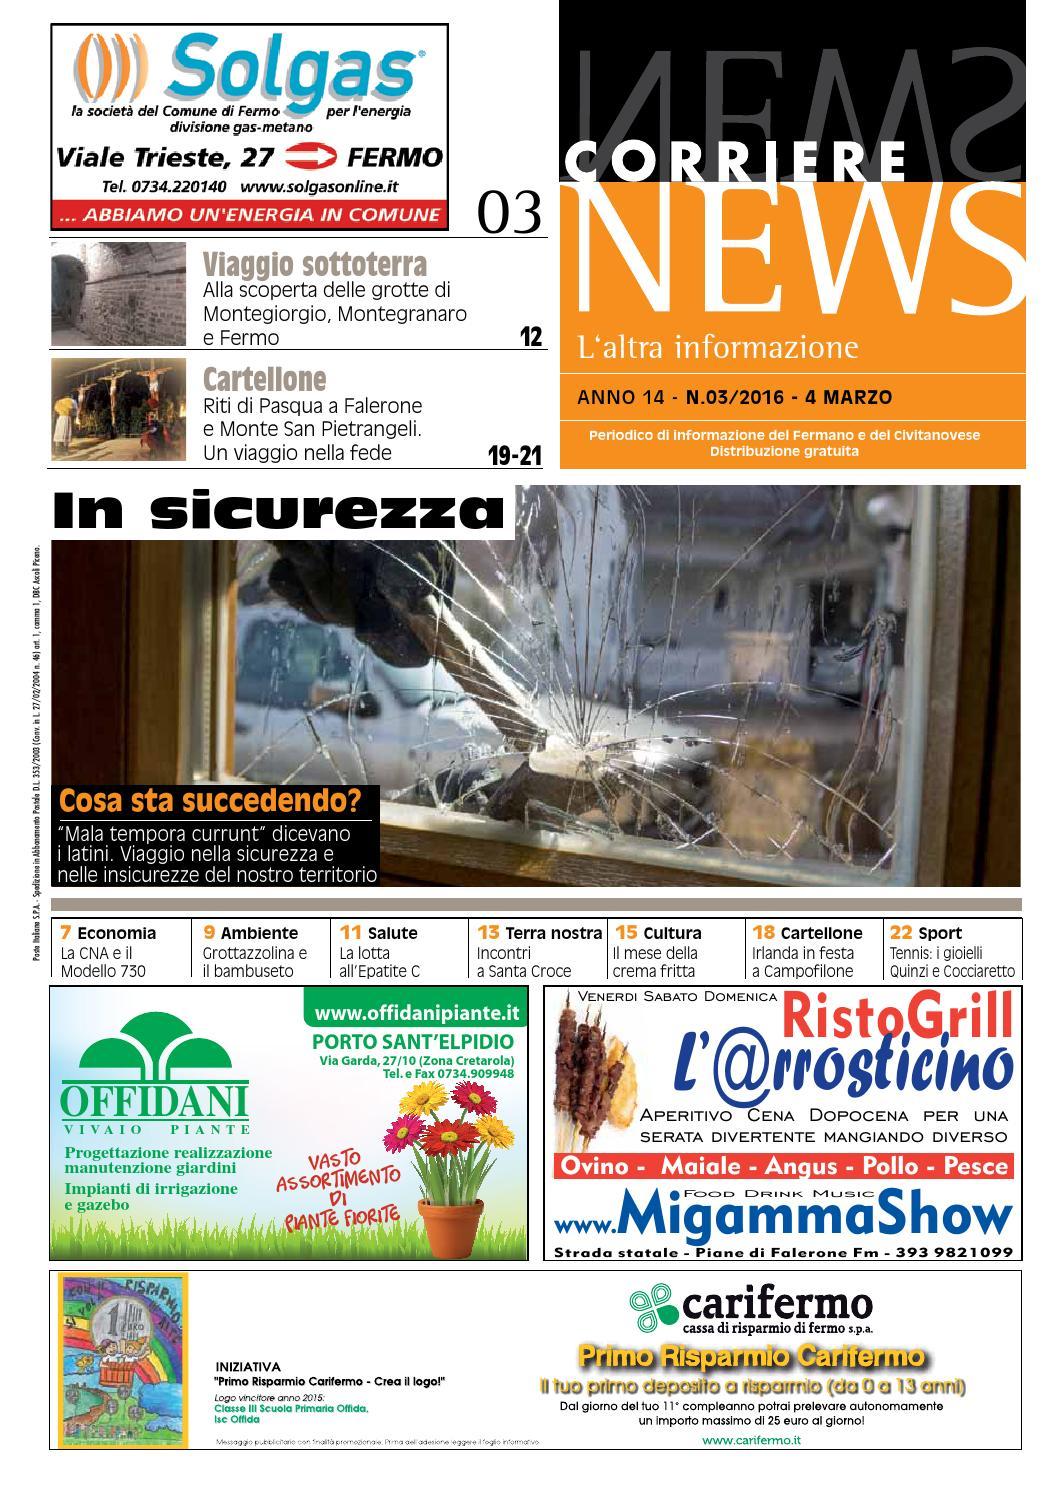 corriere news marzo 2016 by corriere news - issuu - Gazebo Unico Progetta Impresa Stecca Balaustra